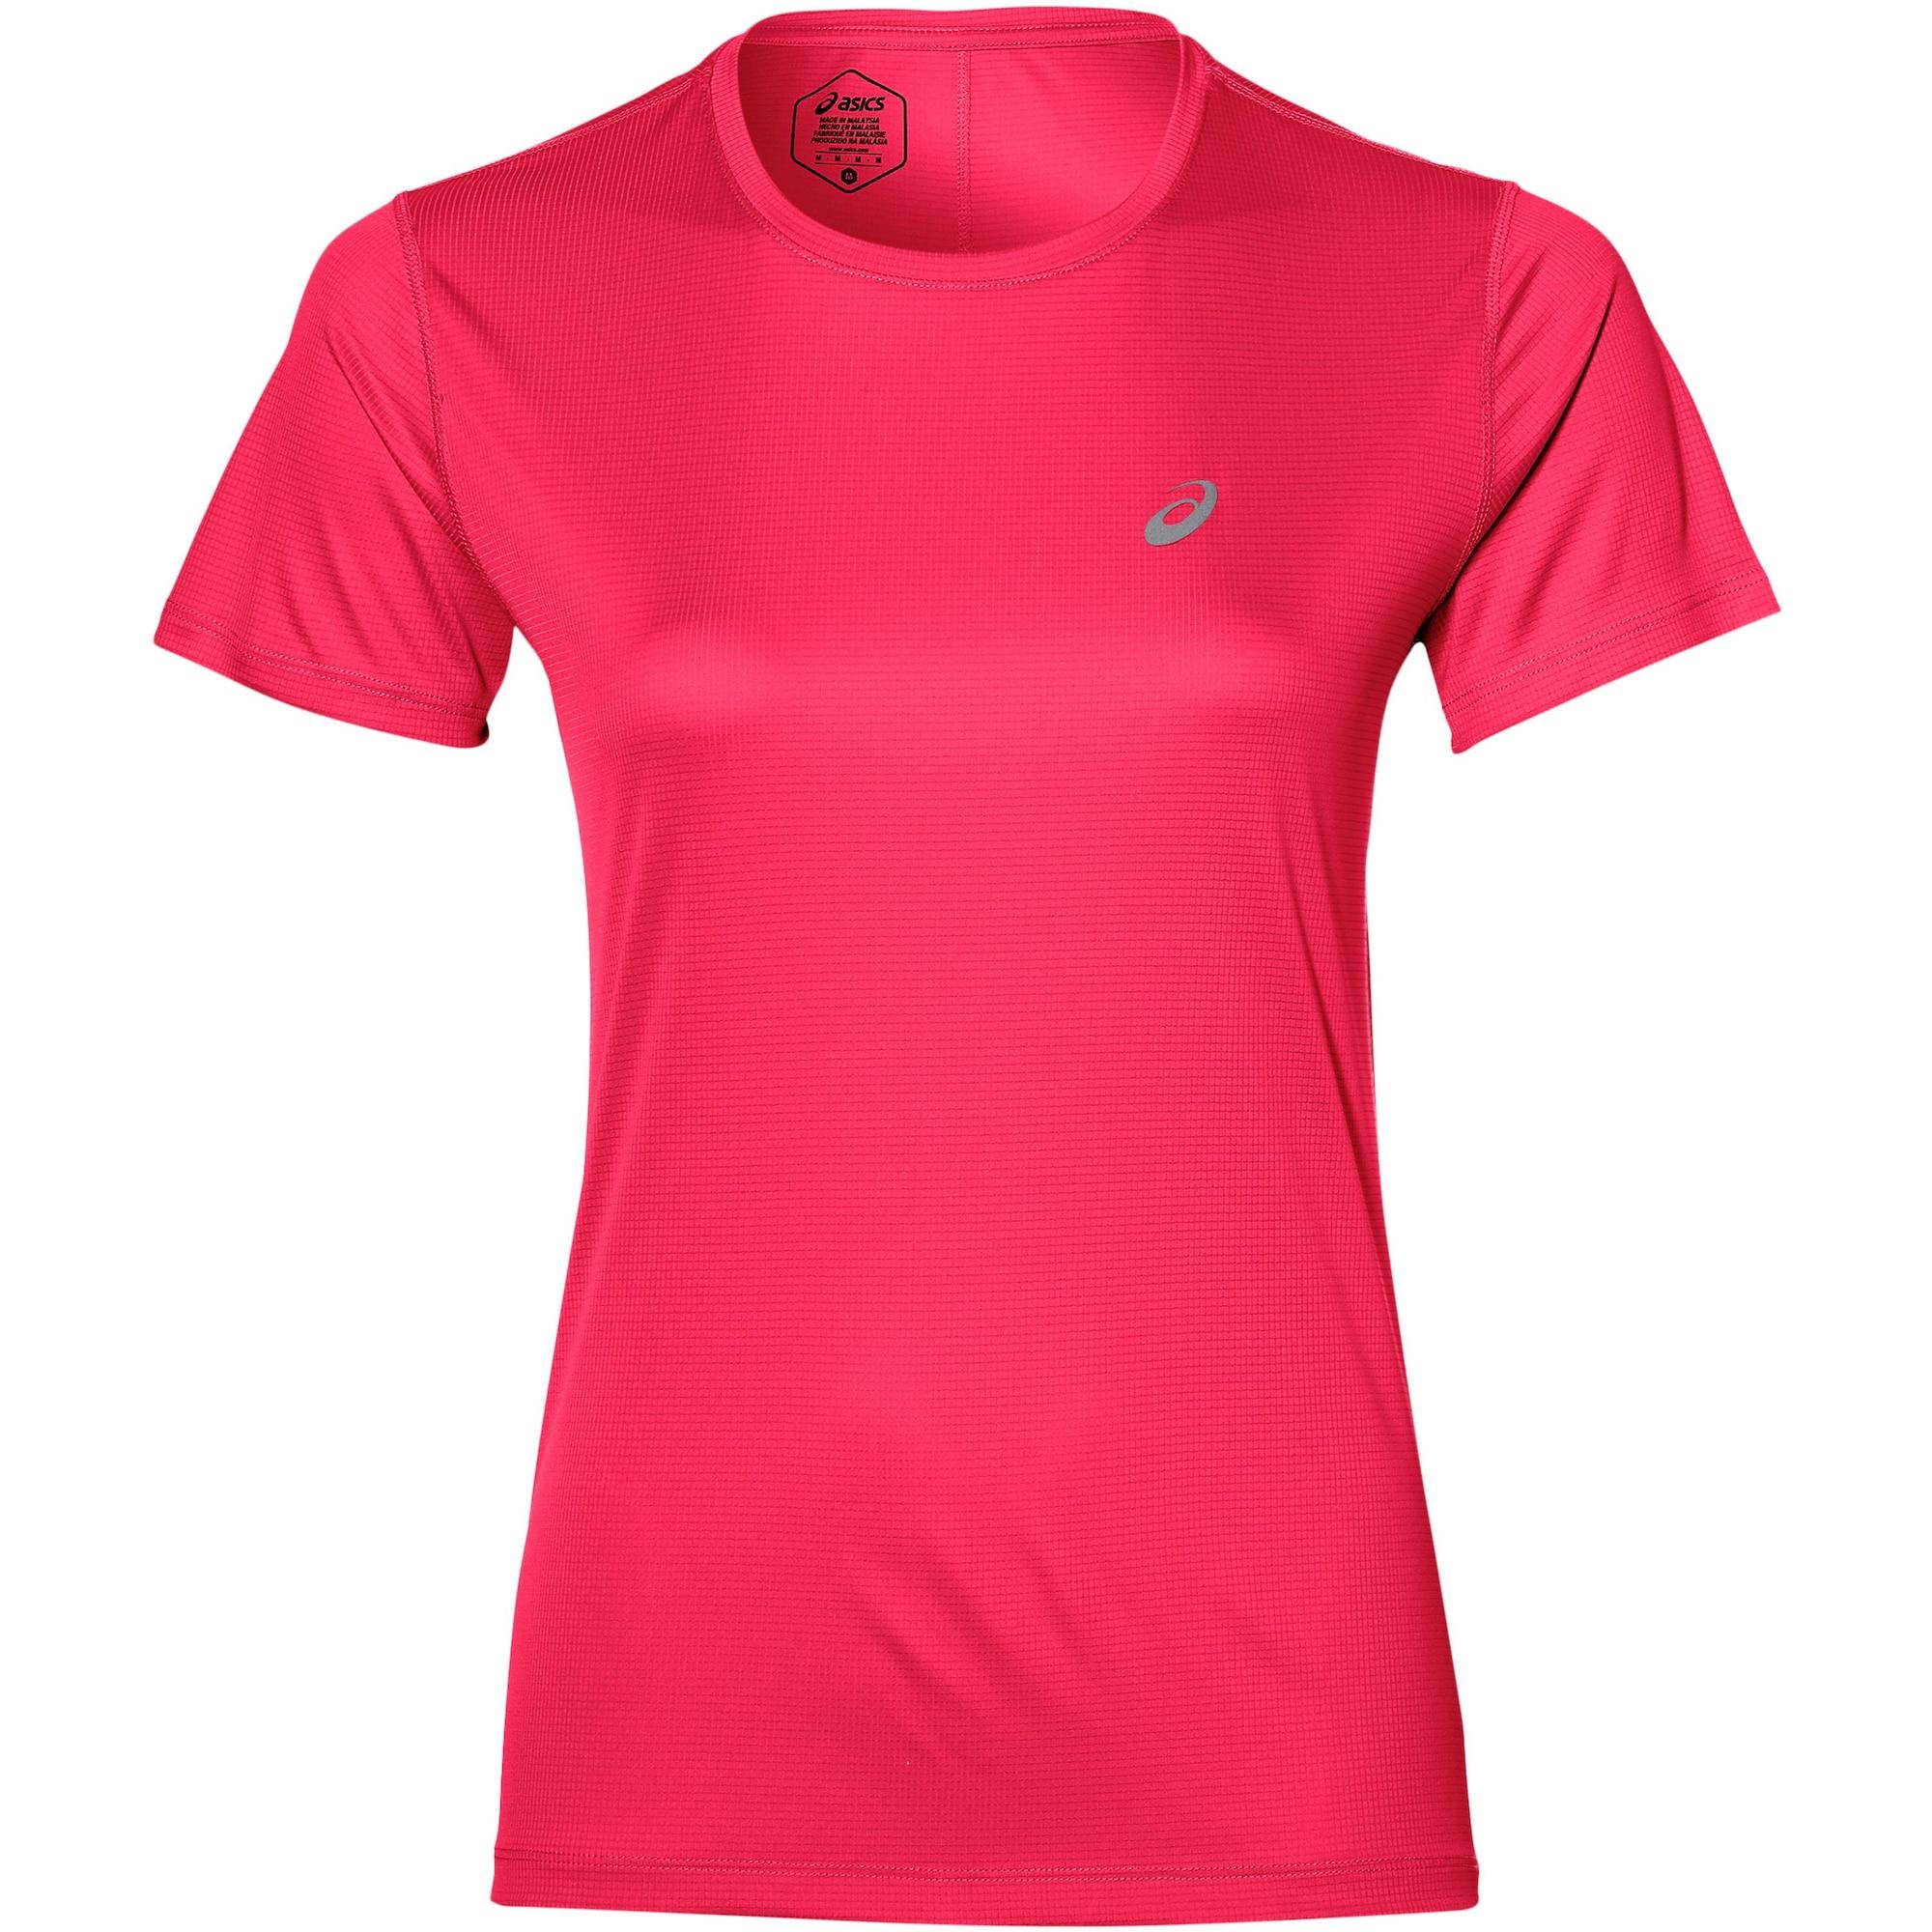 Laufshirt | Sportbekleidung > Sportshirts > Laufshirts | ASICS